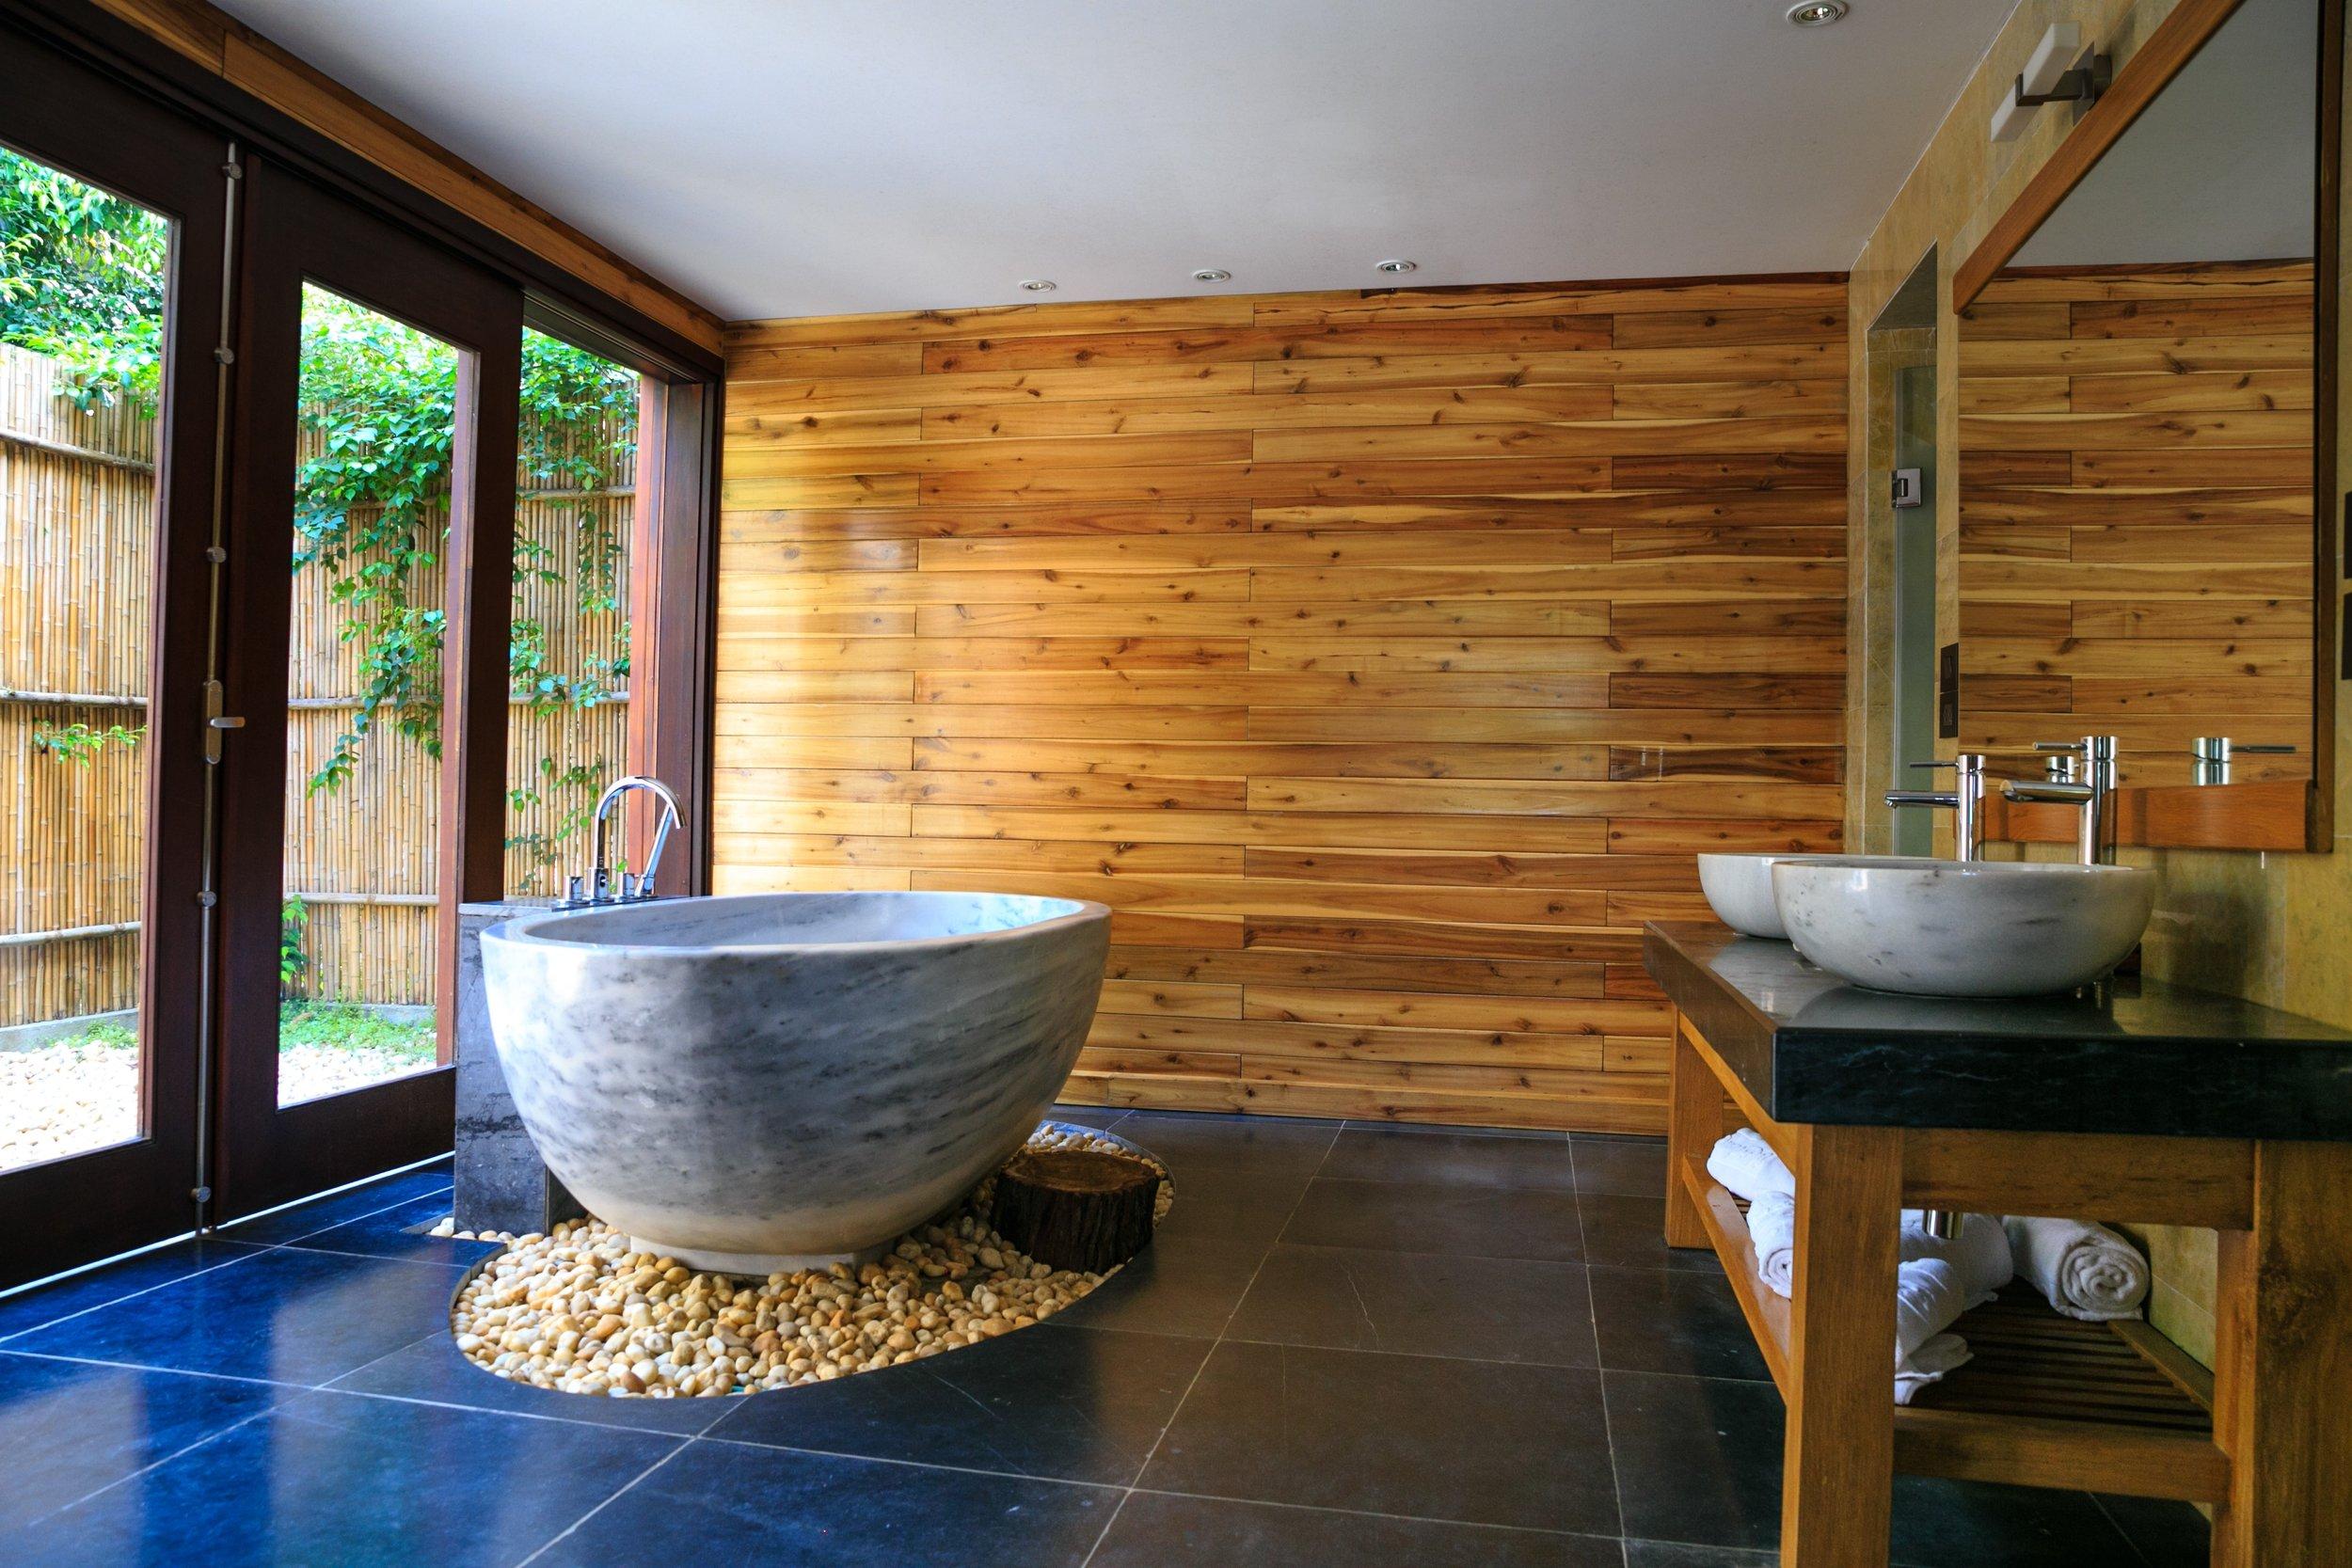 apartment-bathroom-bathtub-2134224.jpg